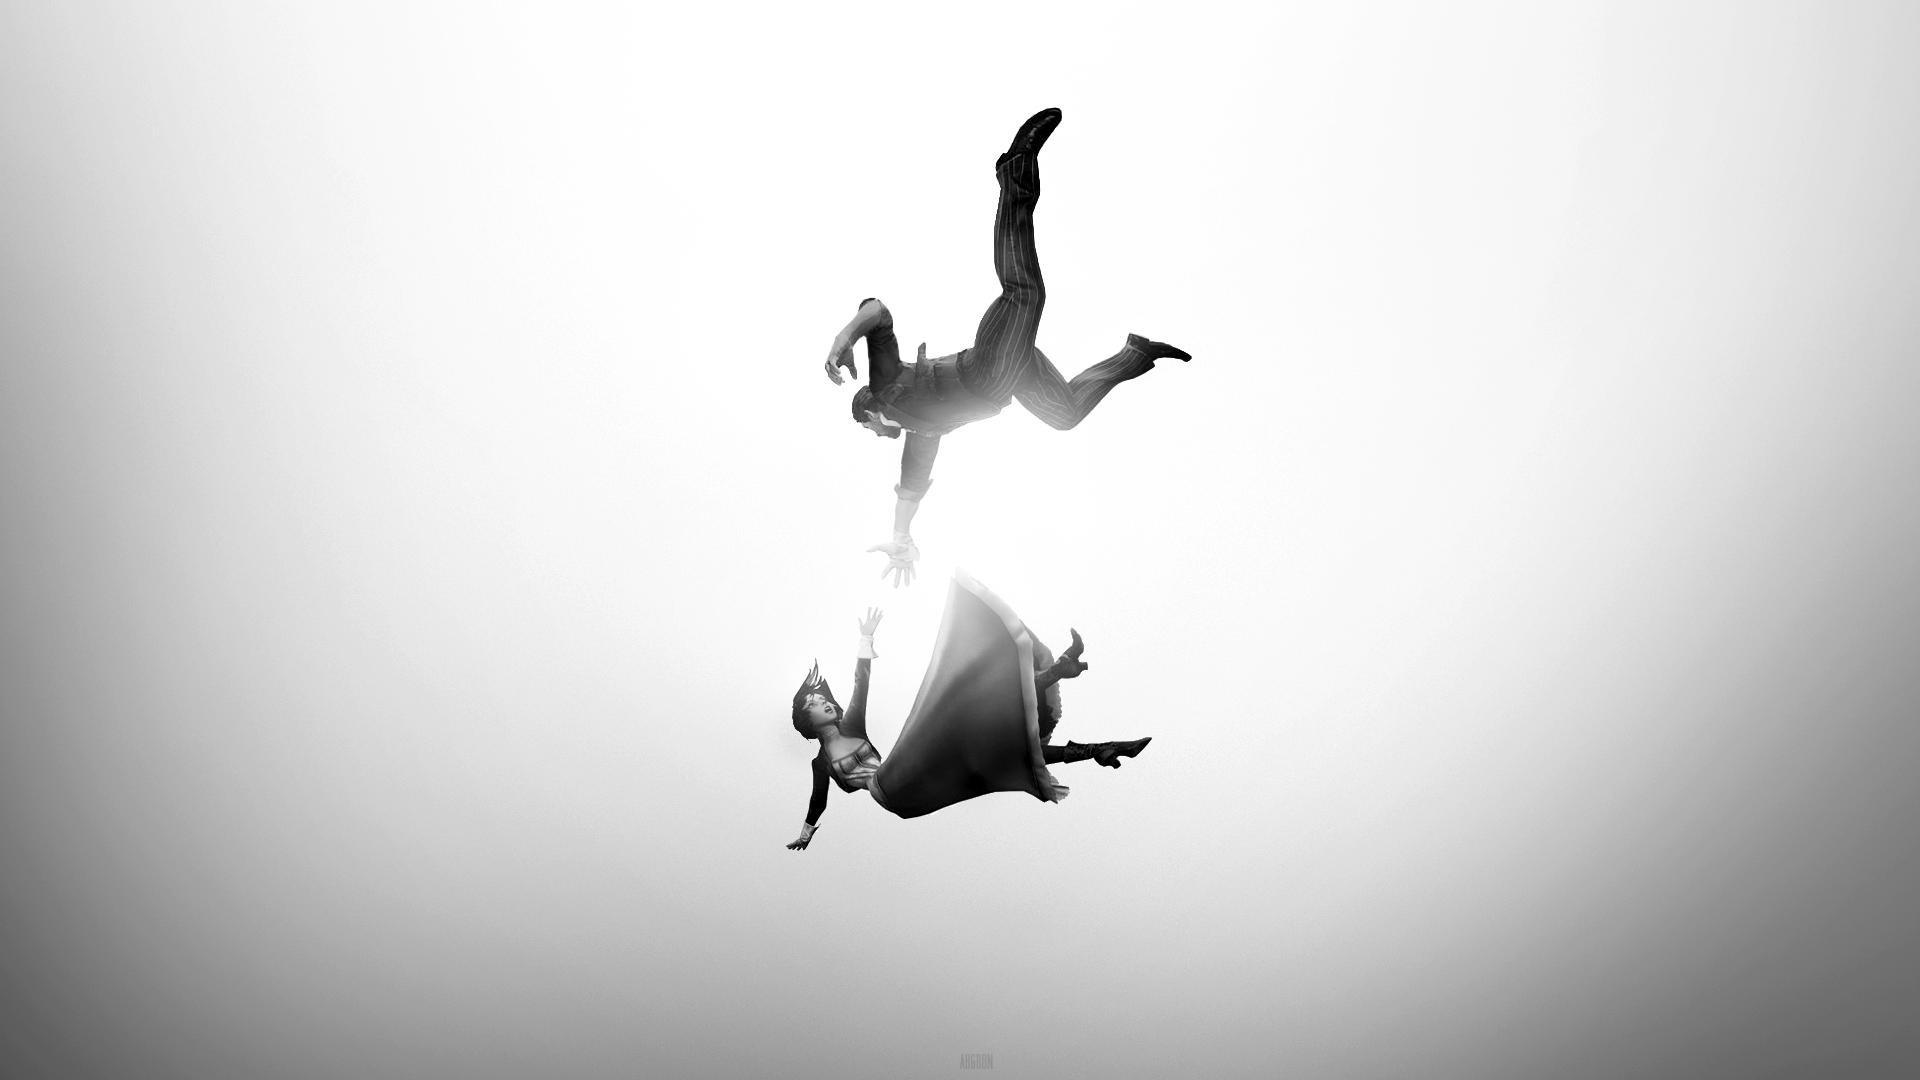 wallpaper jumping silhouette falling bioshock infinite